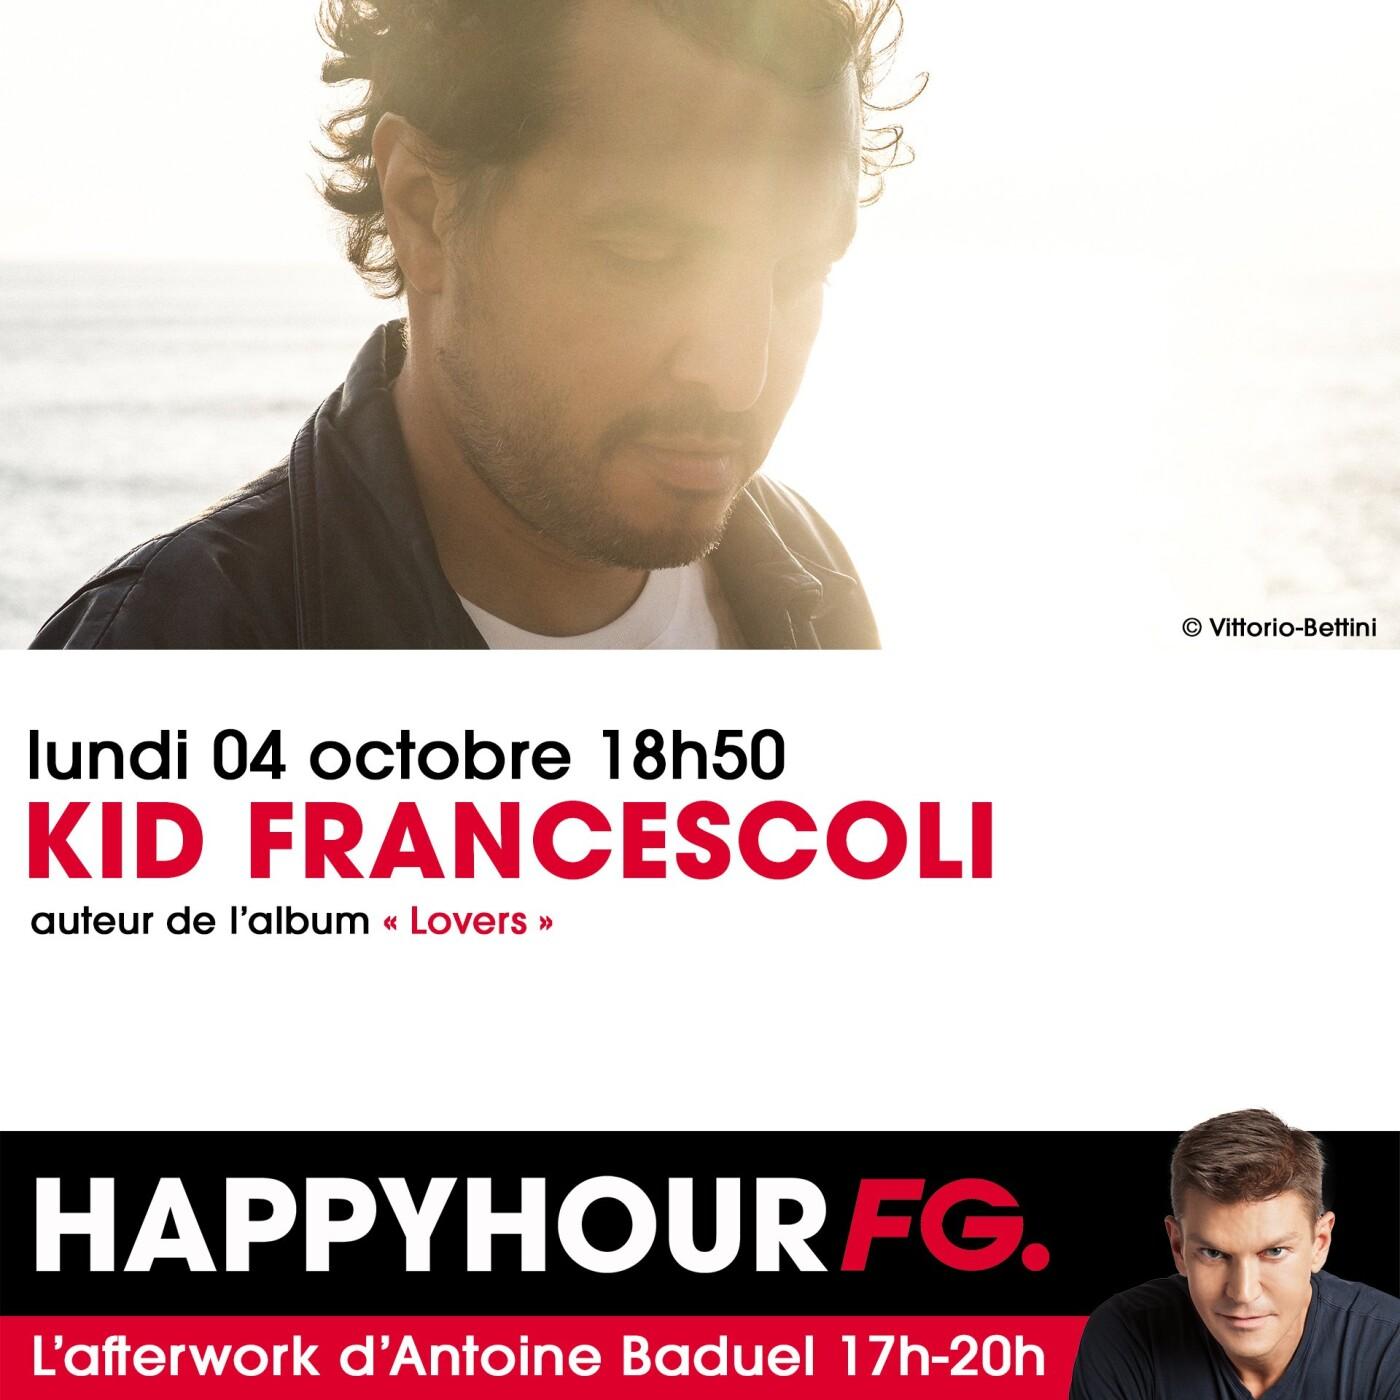 HAPPY HOUR INTERVIEW : KID FRANCESCOLI